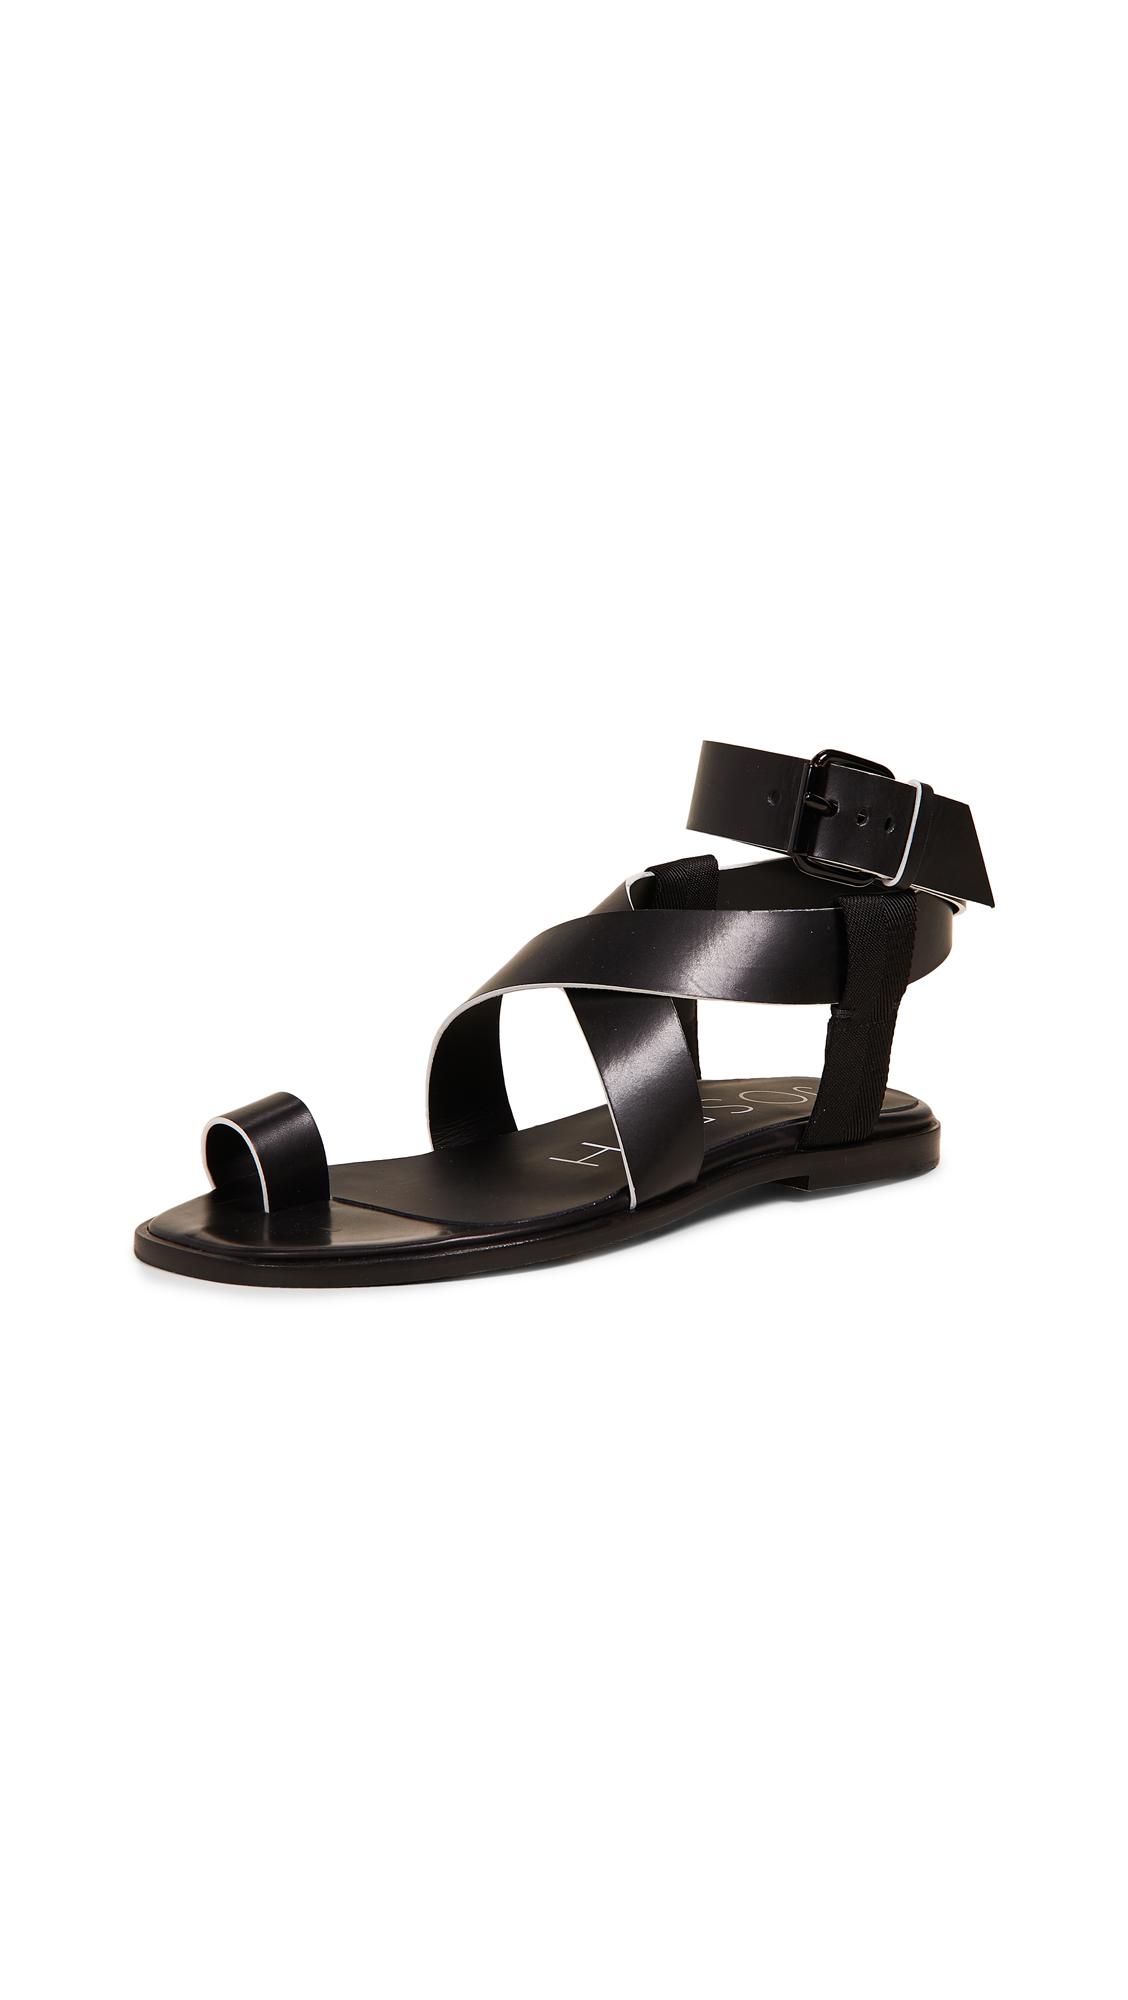 Joseph Trifoglio Sandals - Nero